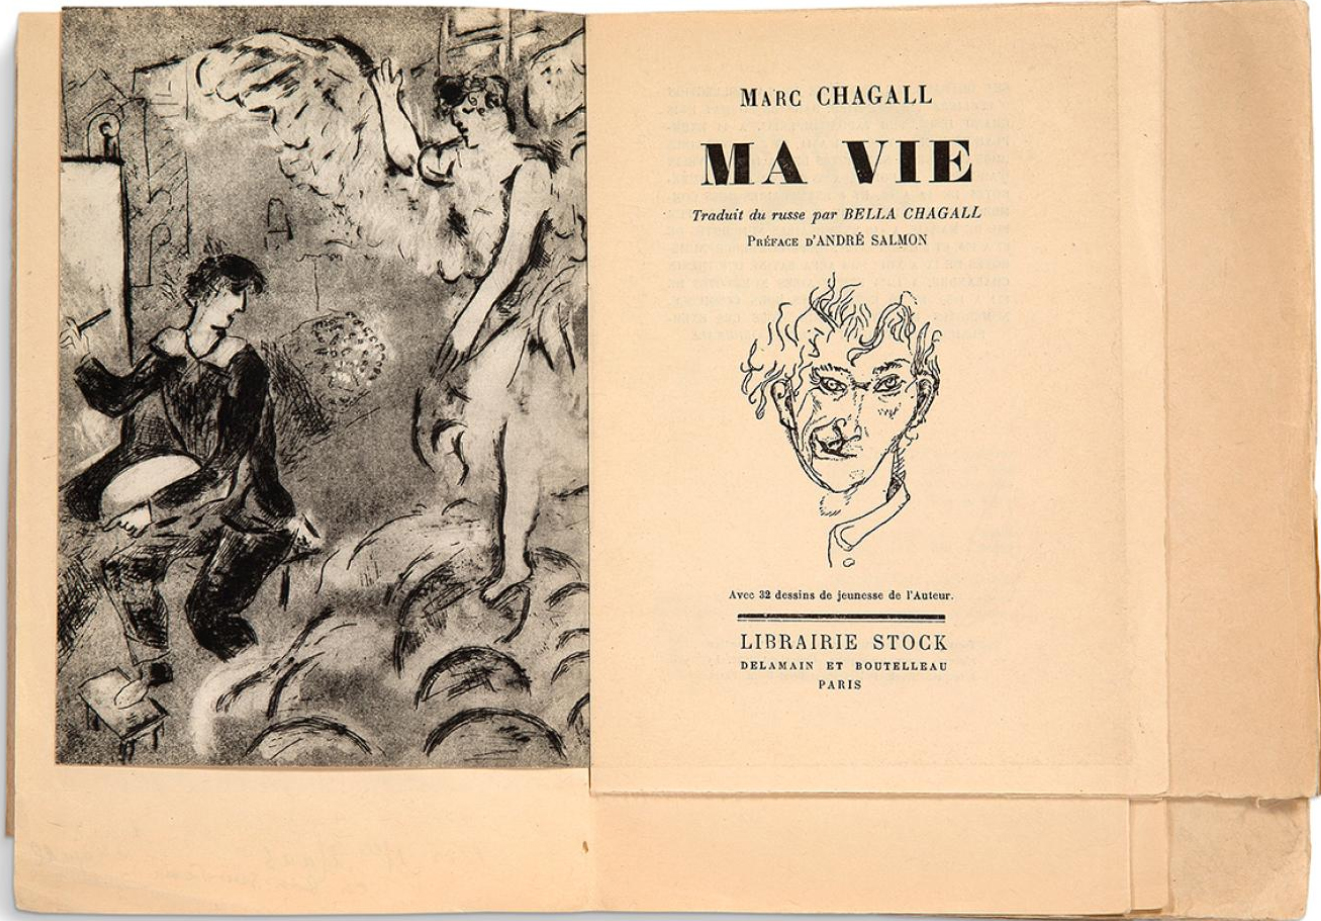 Марк Шагал. «Моя Жизнь» («Ma Vie»: «Librairie Stock», 1931)